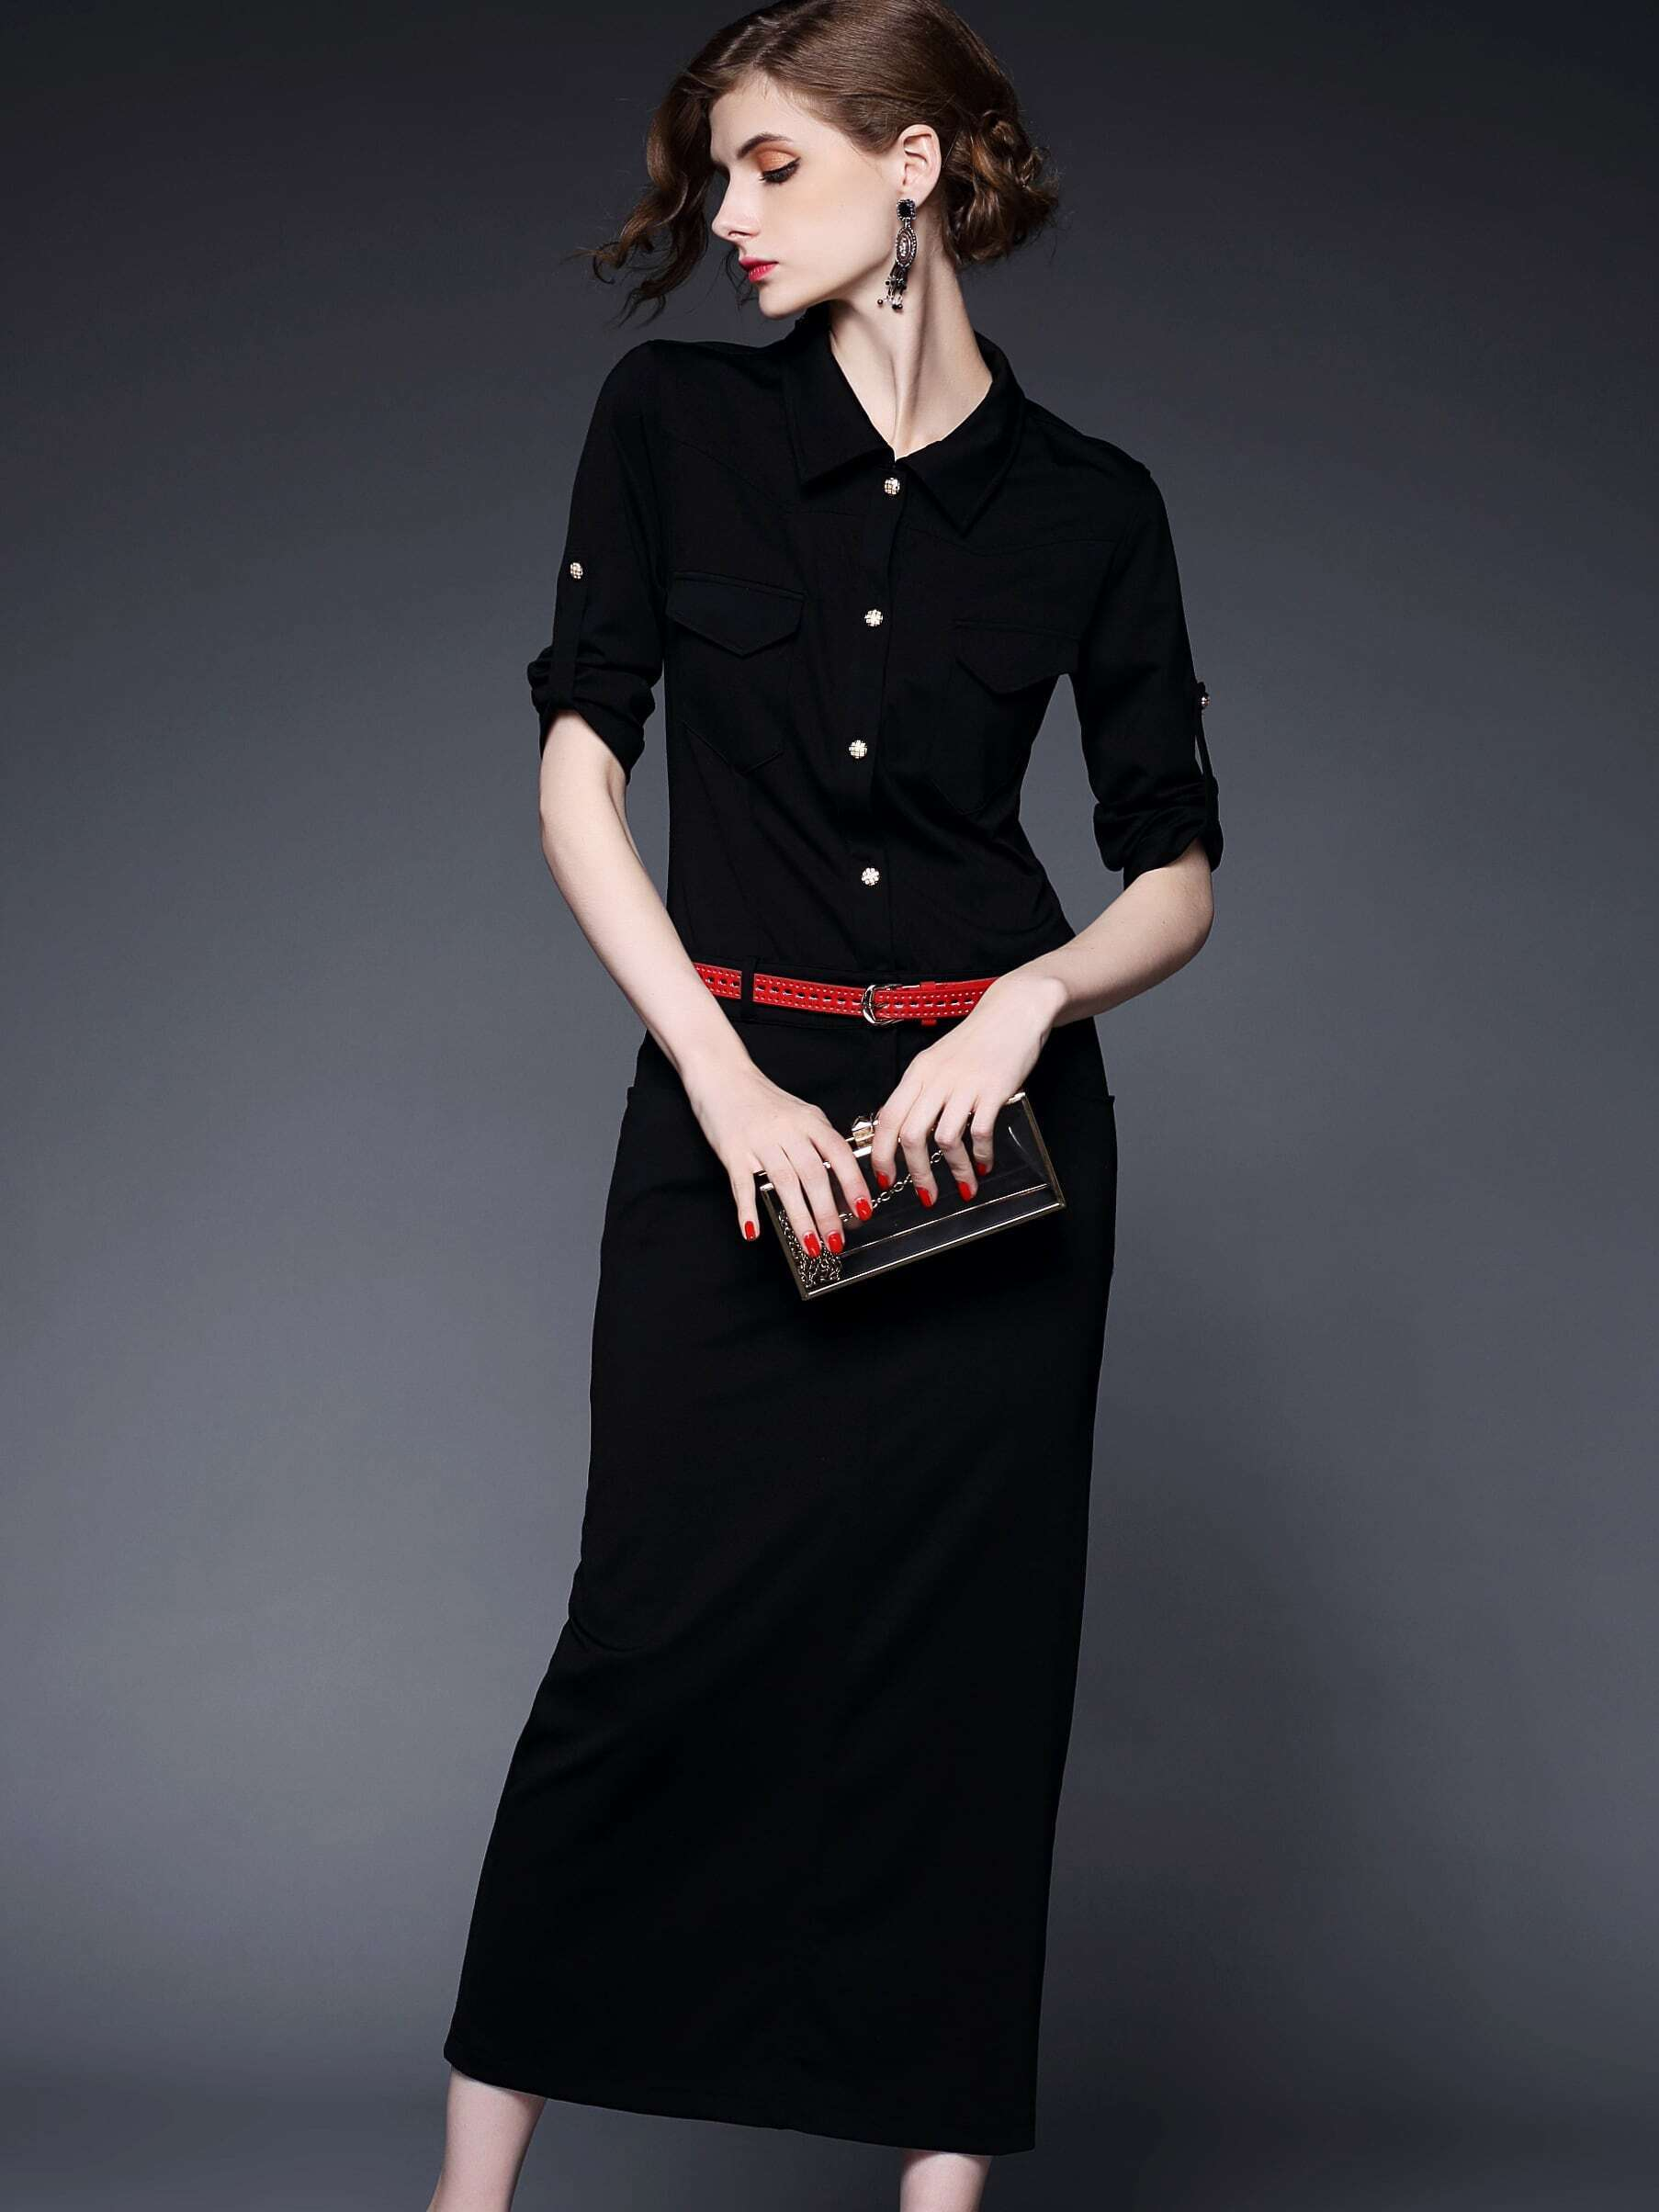 Black Lapel Half Sleeve Drawstring Pockets Dress